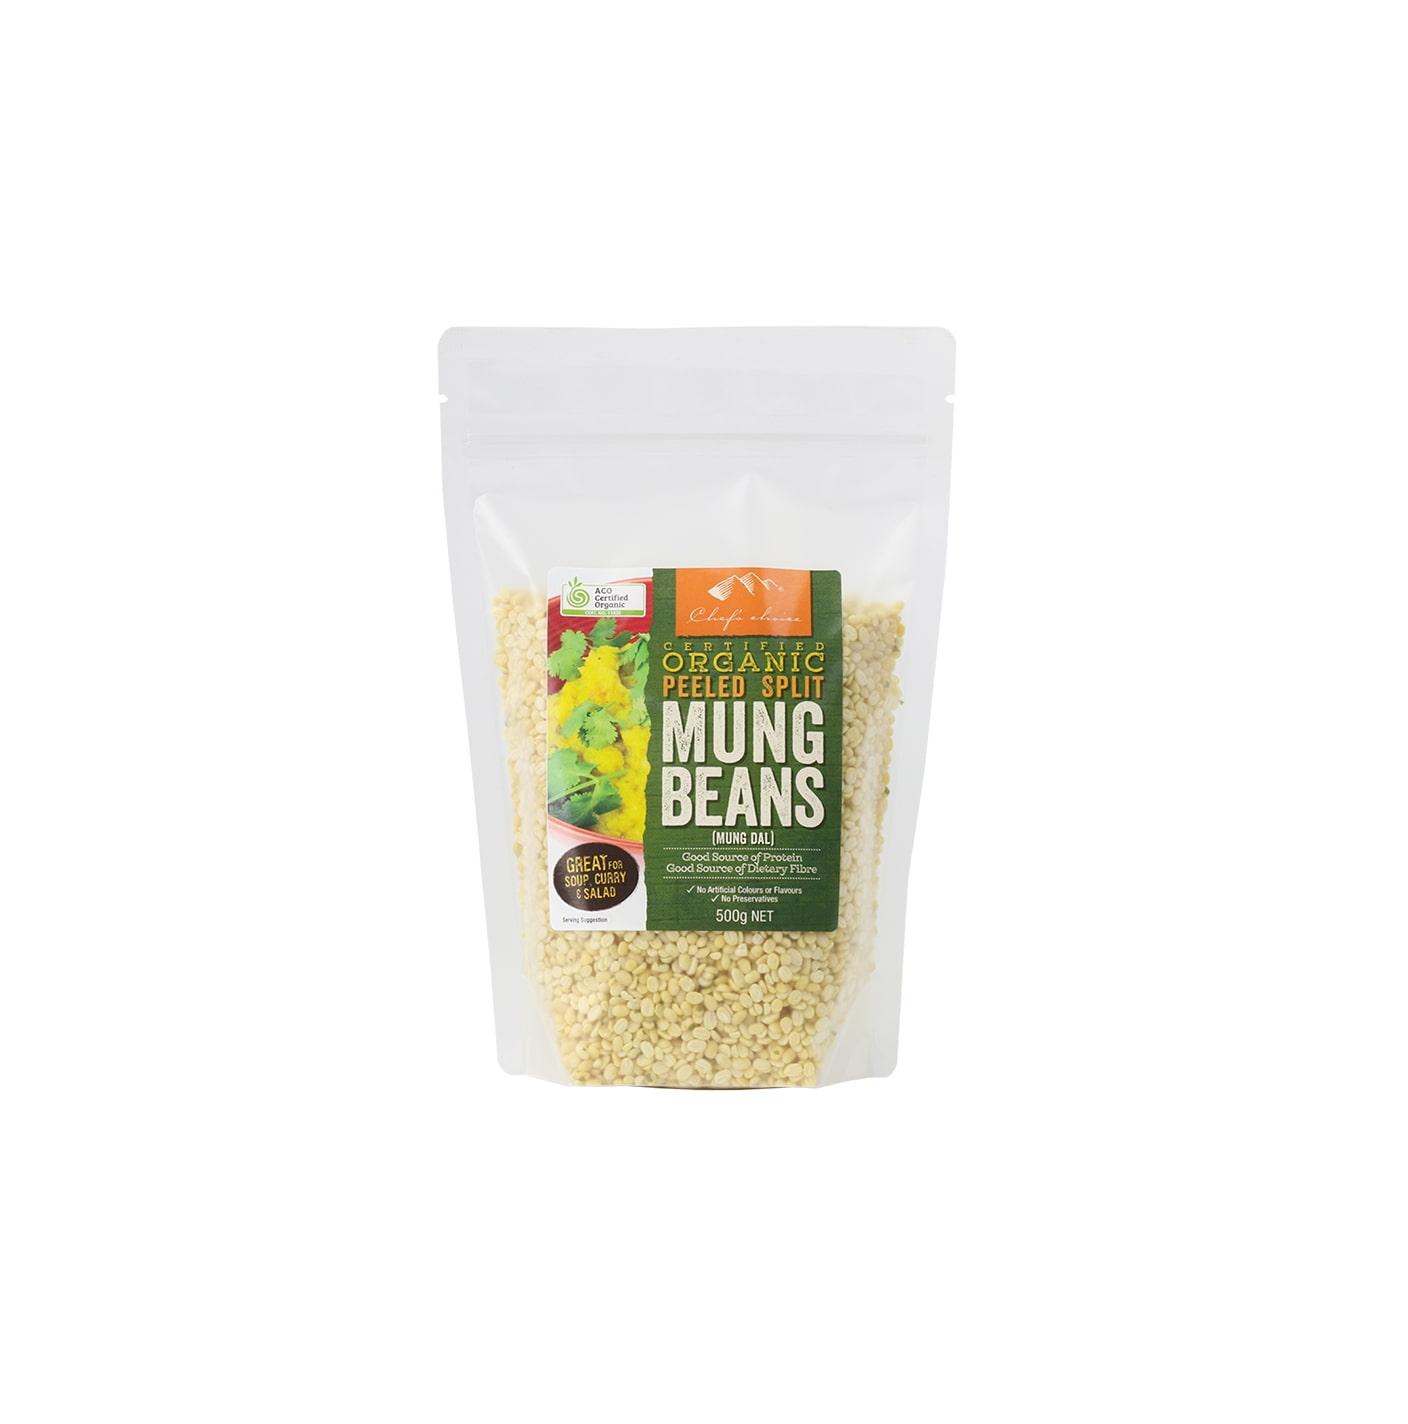 Organic Peeled Split Mung Beans 500g